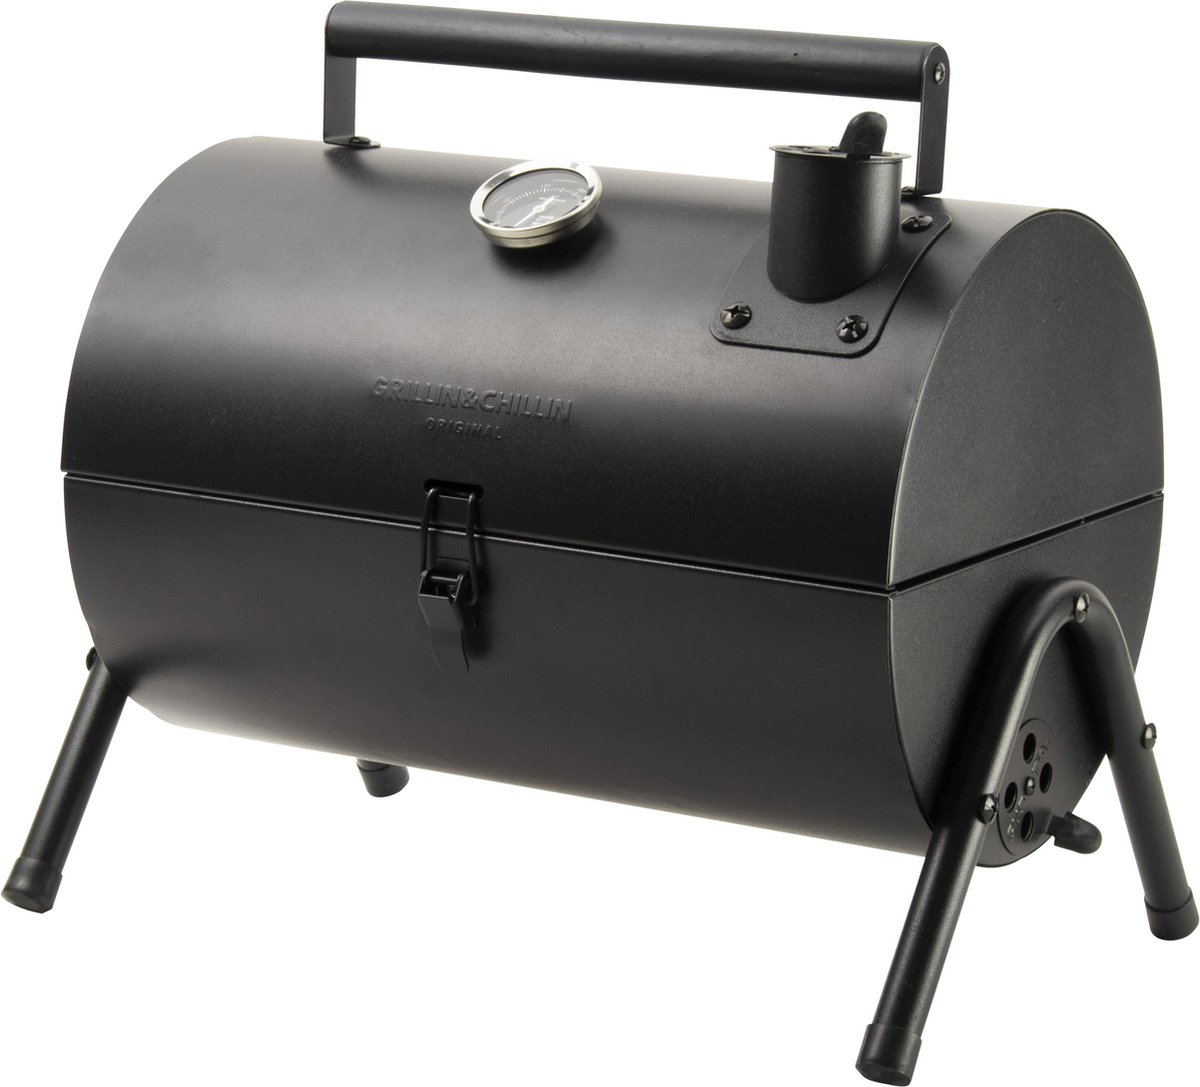 Gusta Barbecue Grill en Smoker - Grilloppervlak (LxB) 22 x 18 cm - Met Thermometer - Zwart